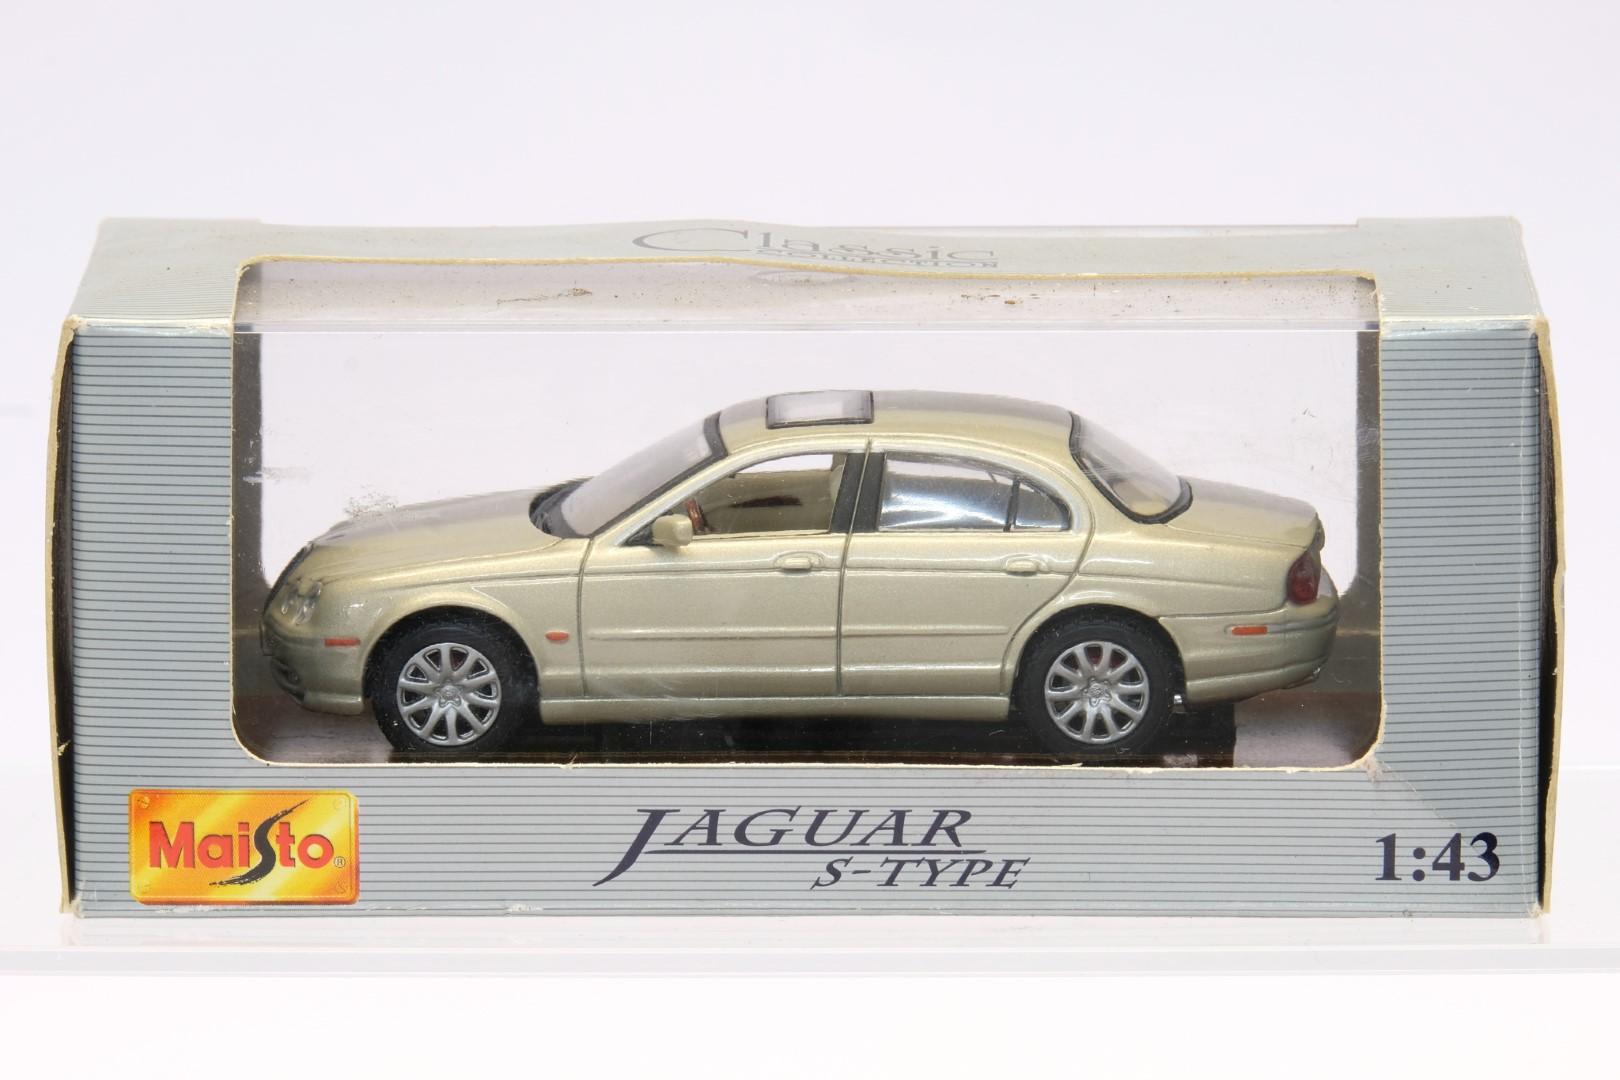 Maisto 3 Jaguar Models - Image 2 of 4